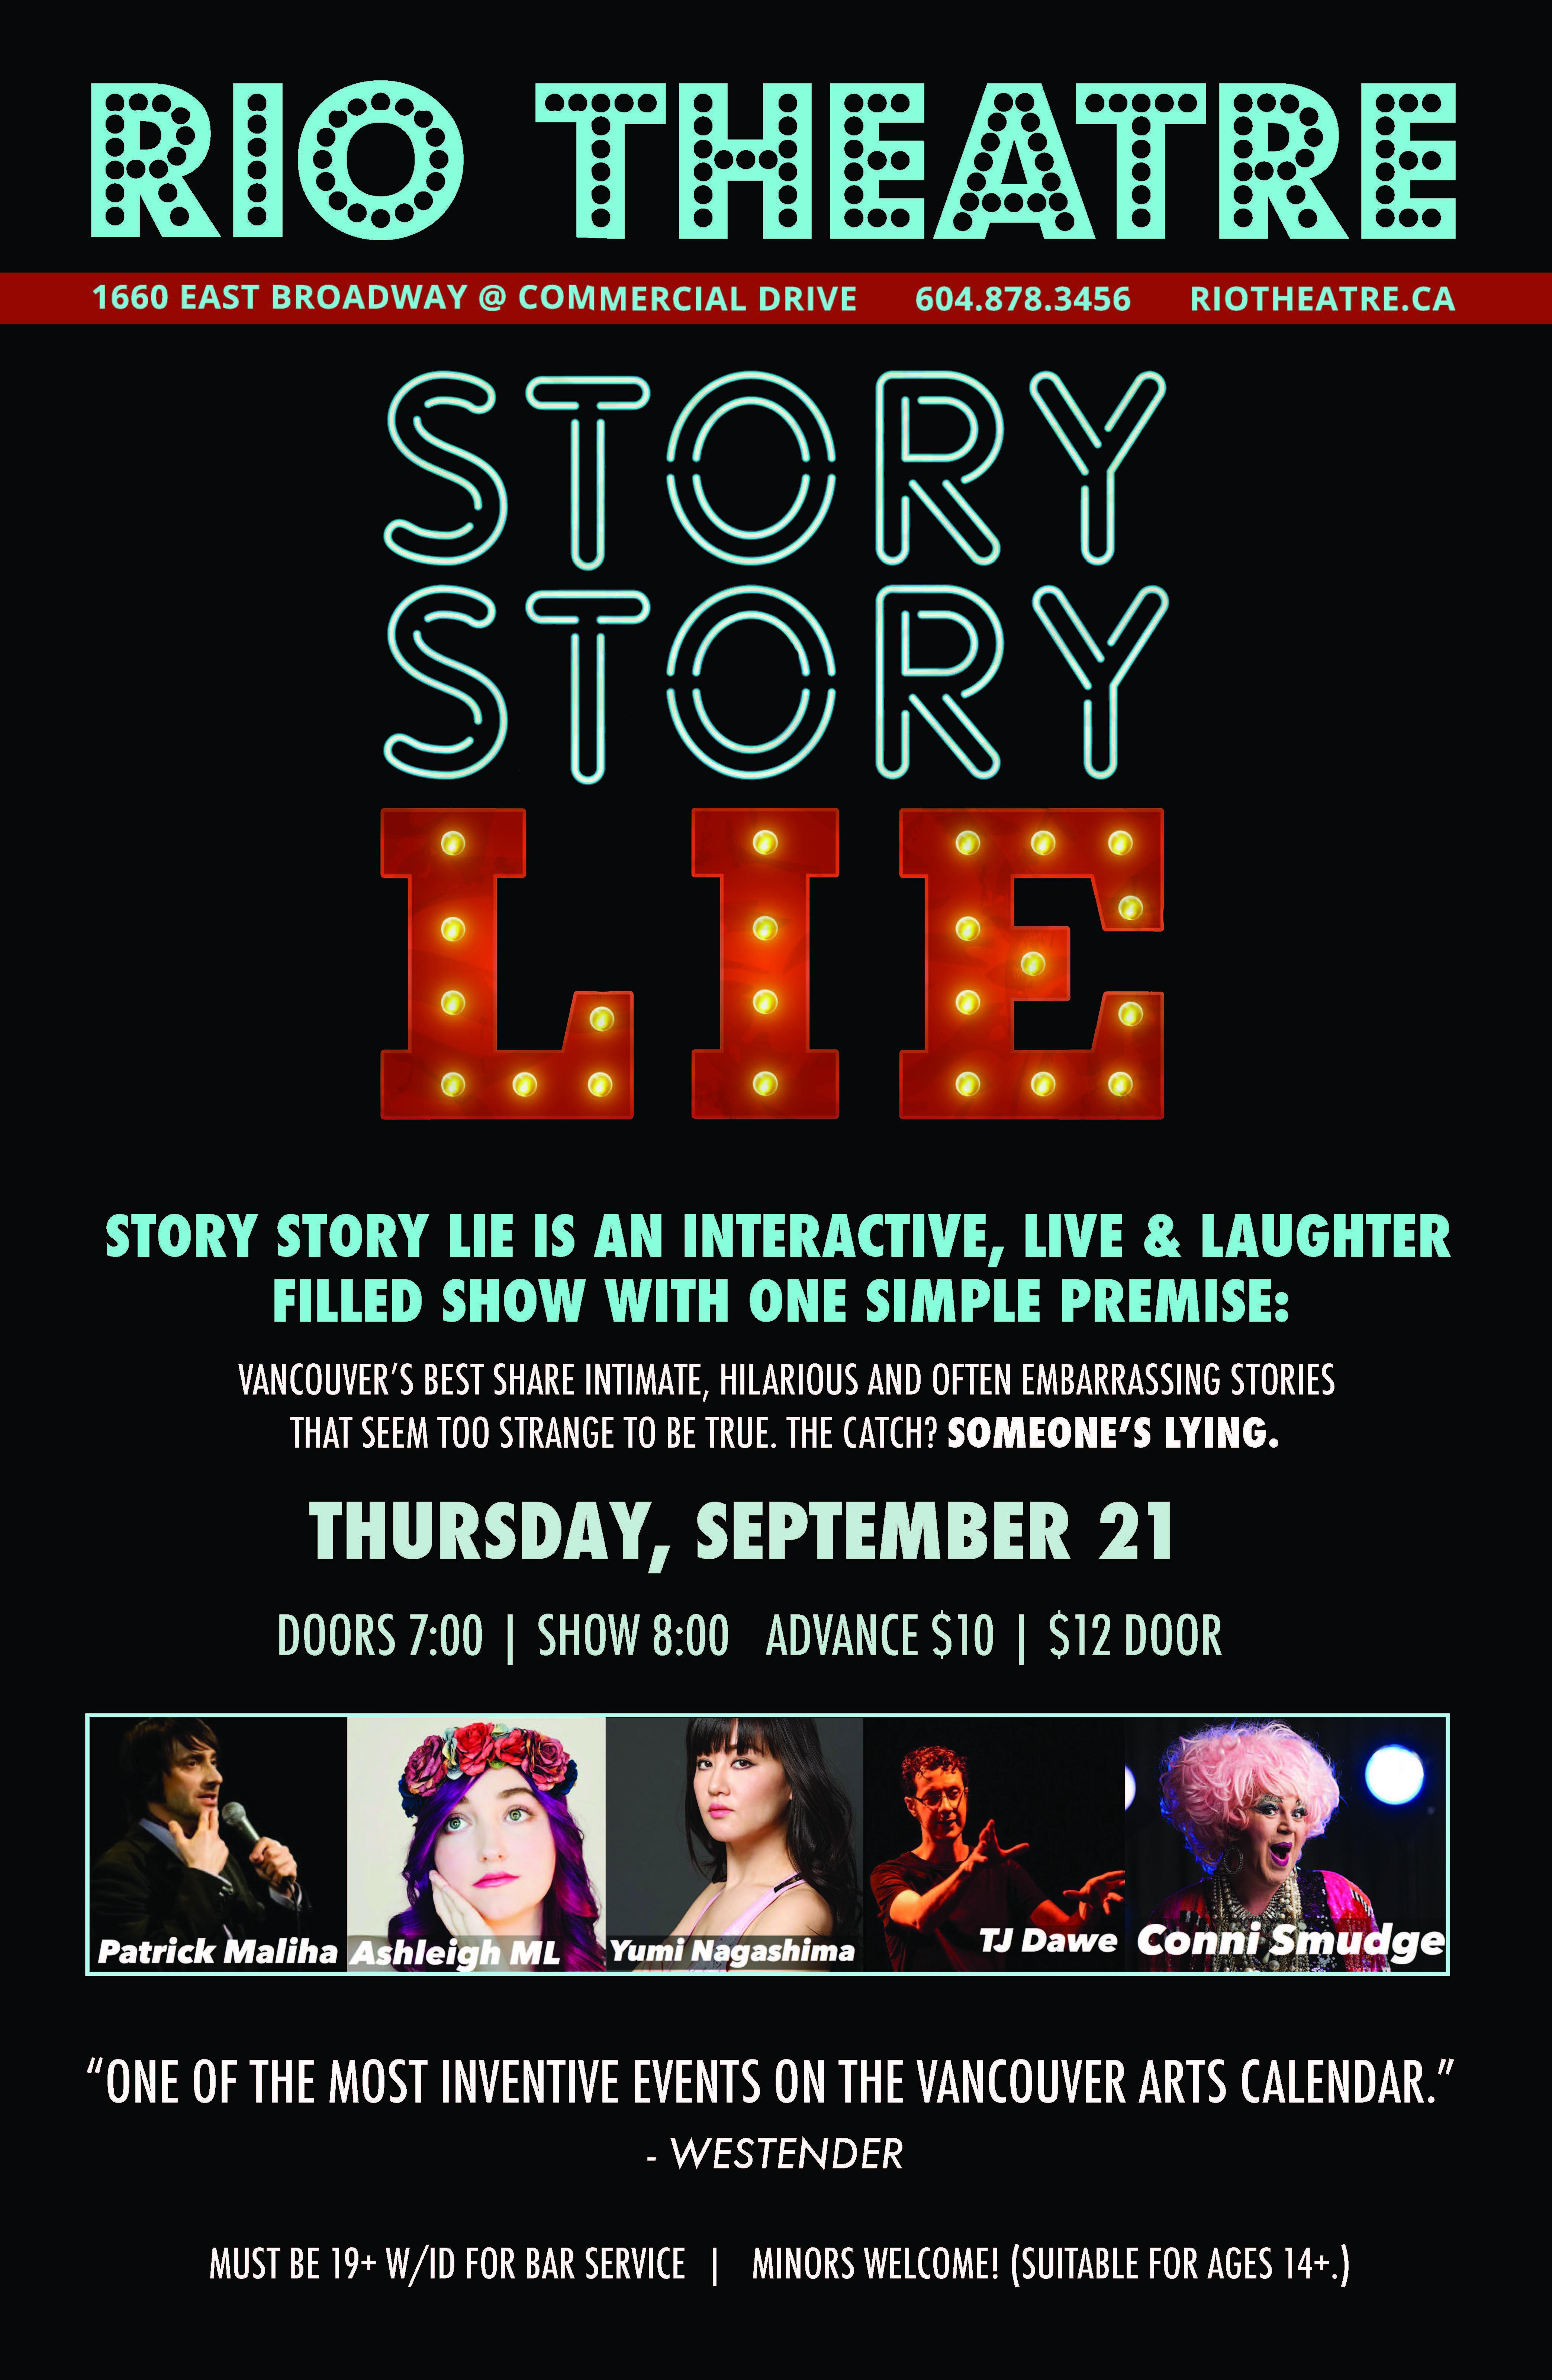 Story Story Lie